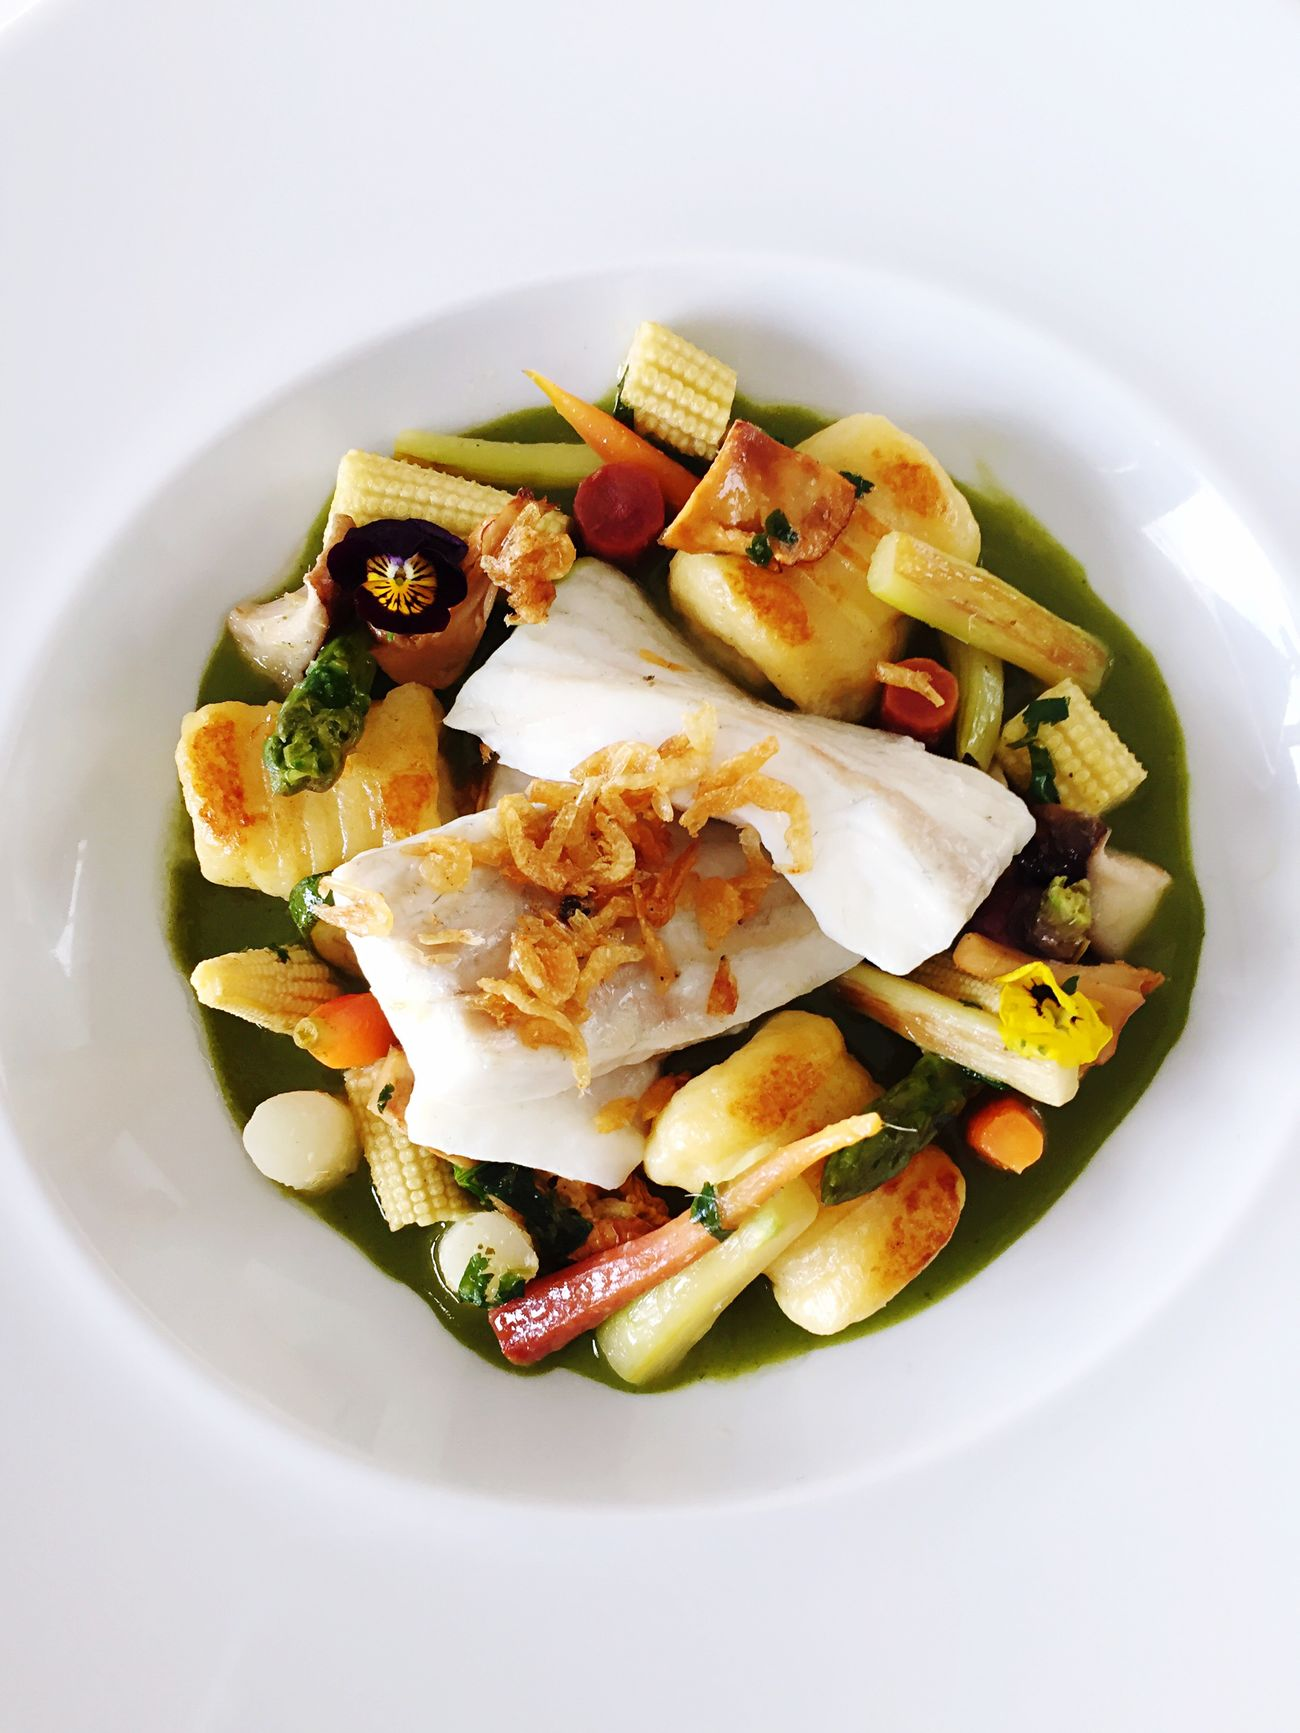 GoodTimes Good Food Enjoying Life Land Vineyards 5 Star Service Michelin Star Guanilho Boa Mesa